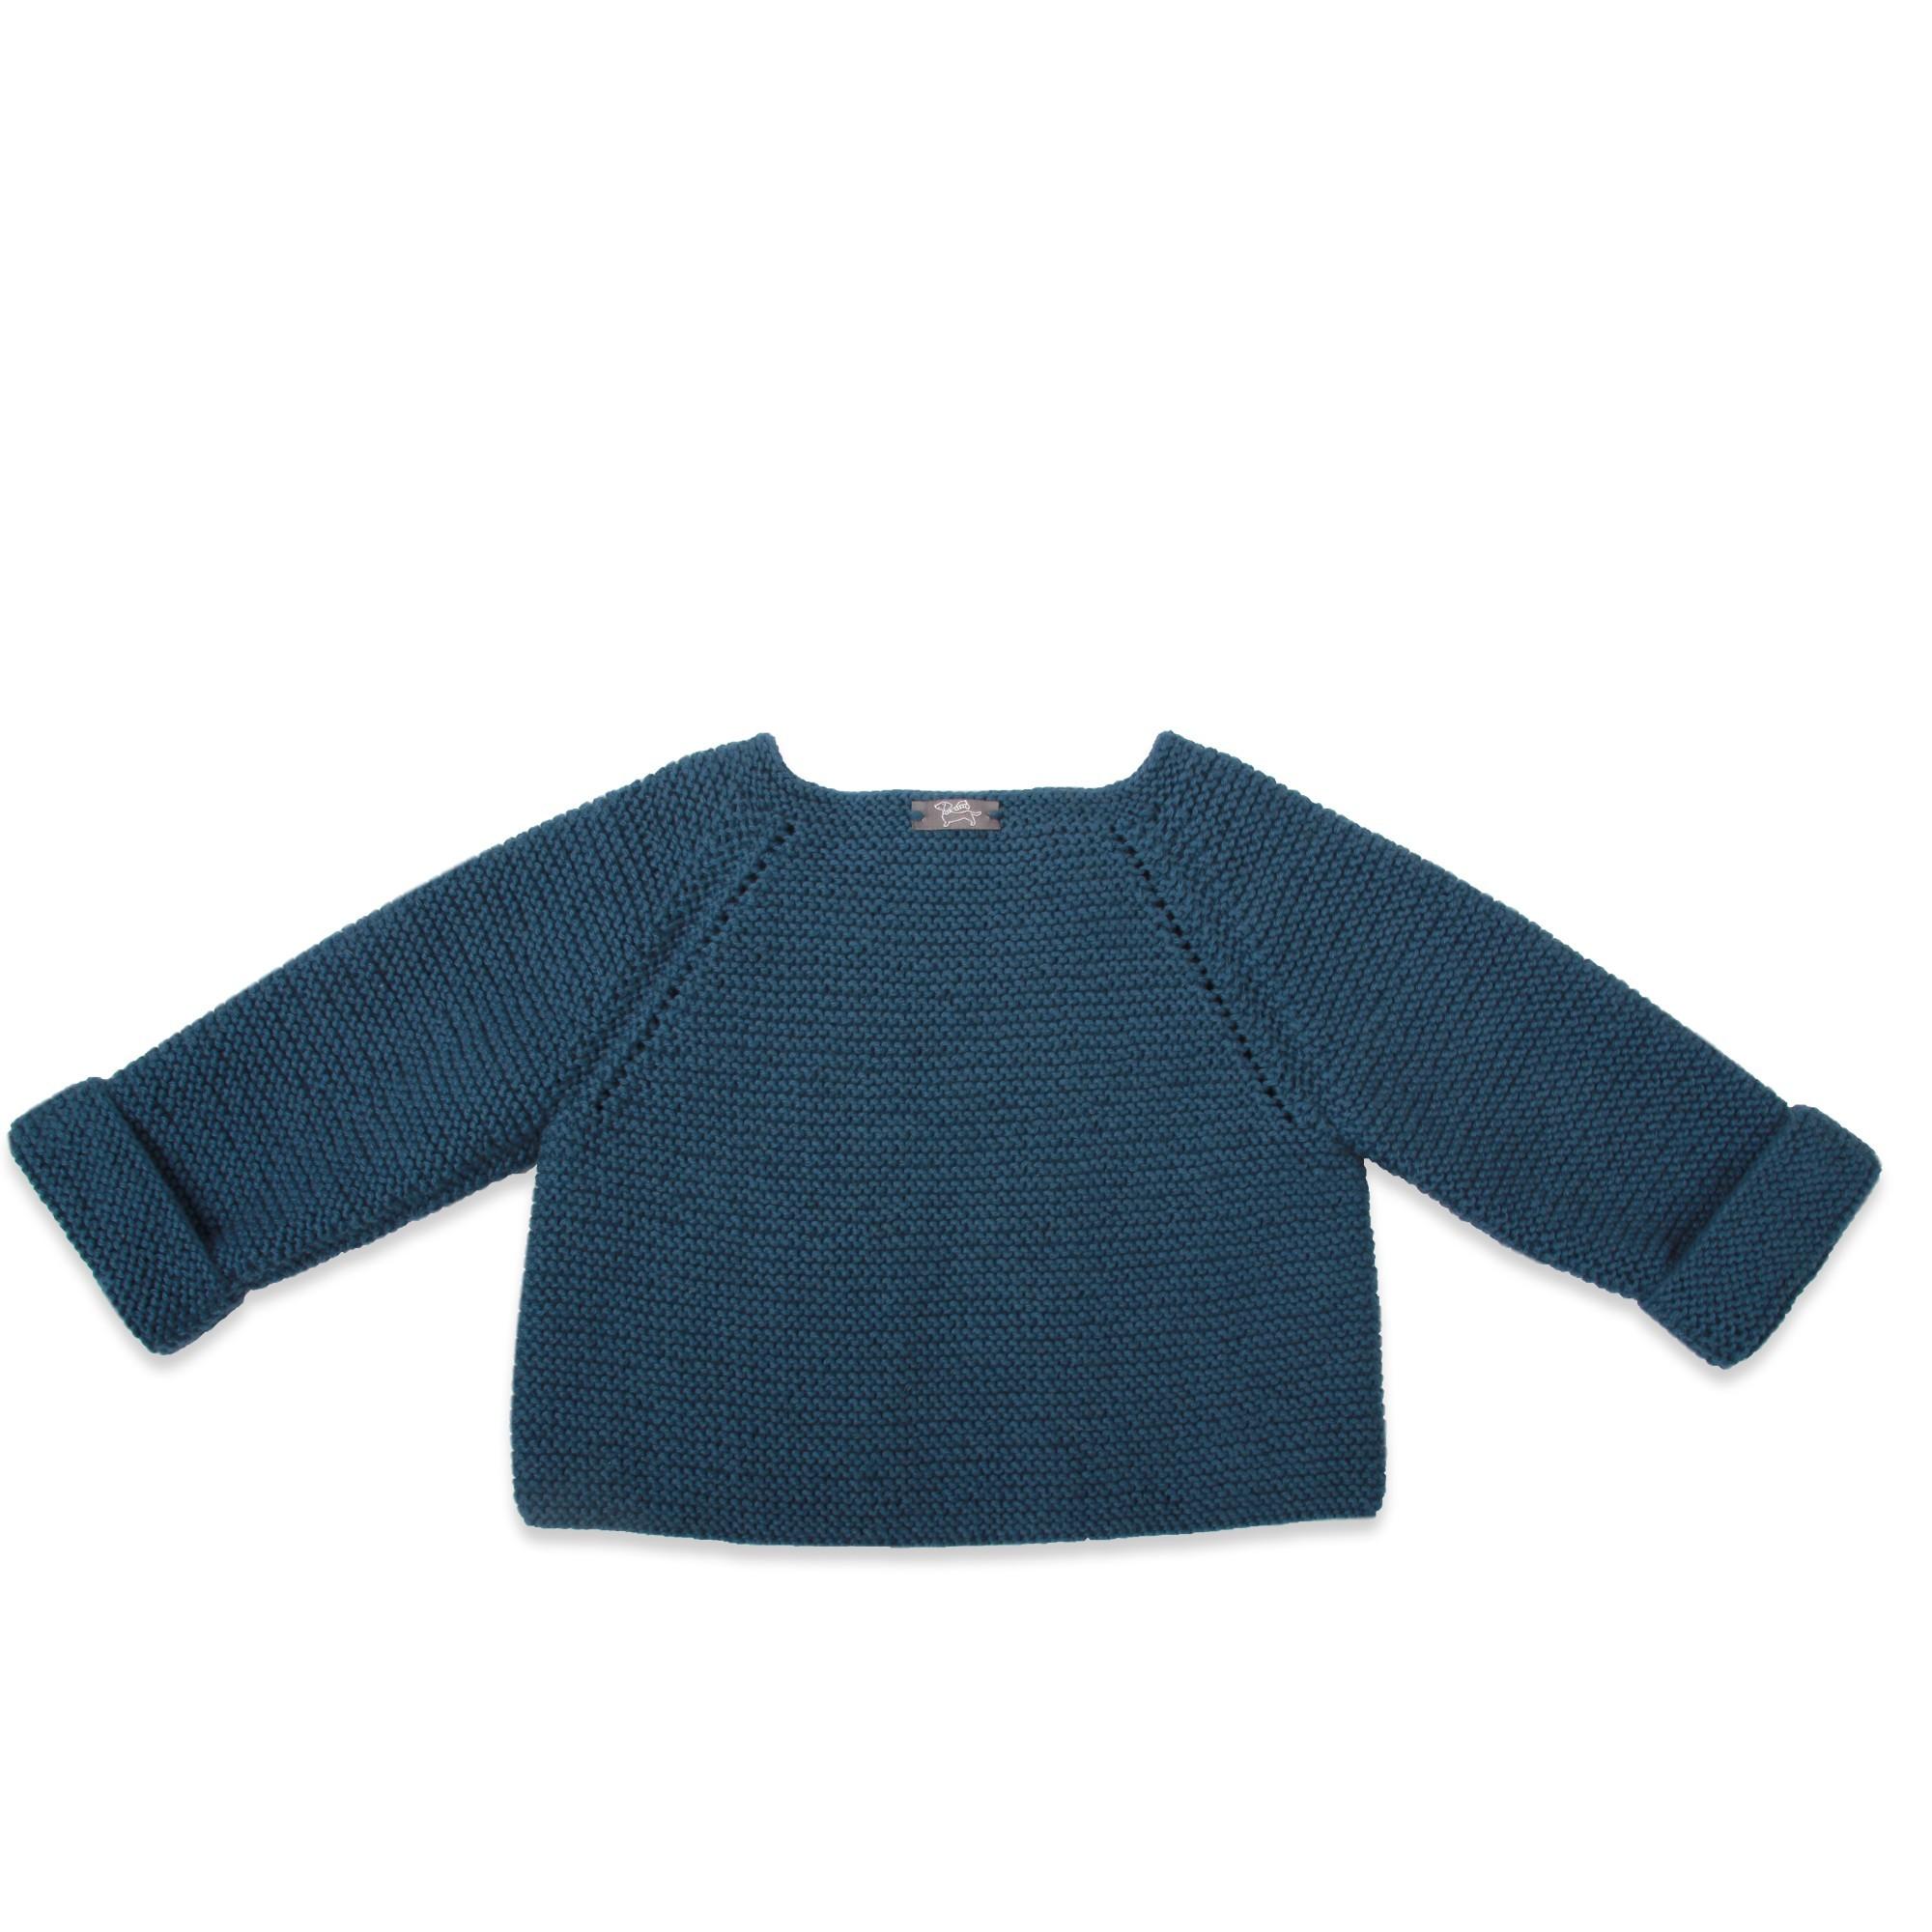 baby's cardigan blue garter stitch